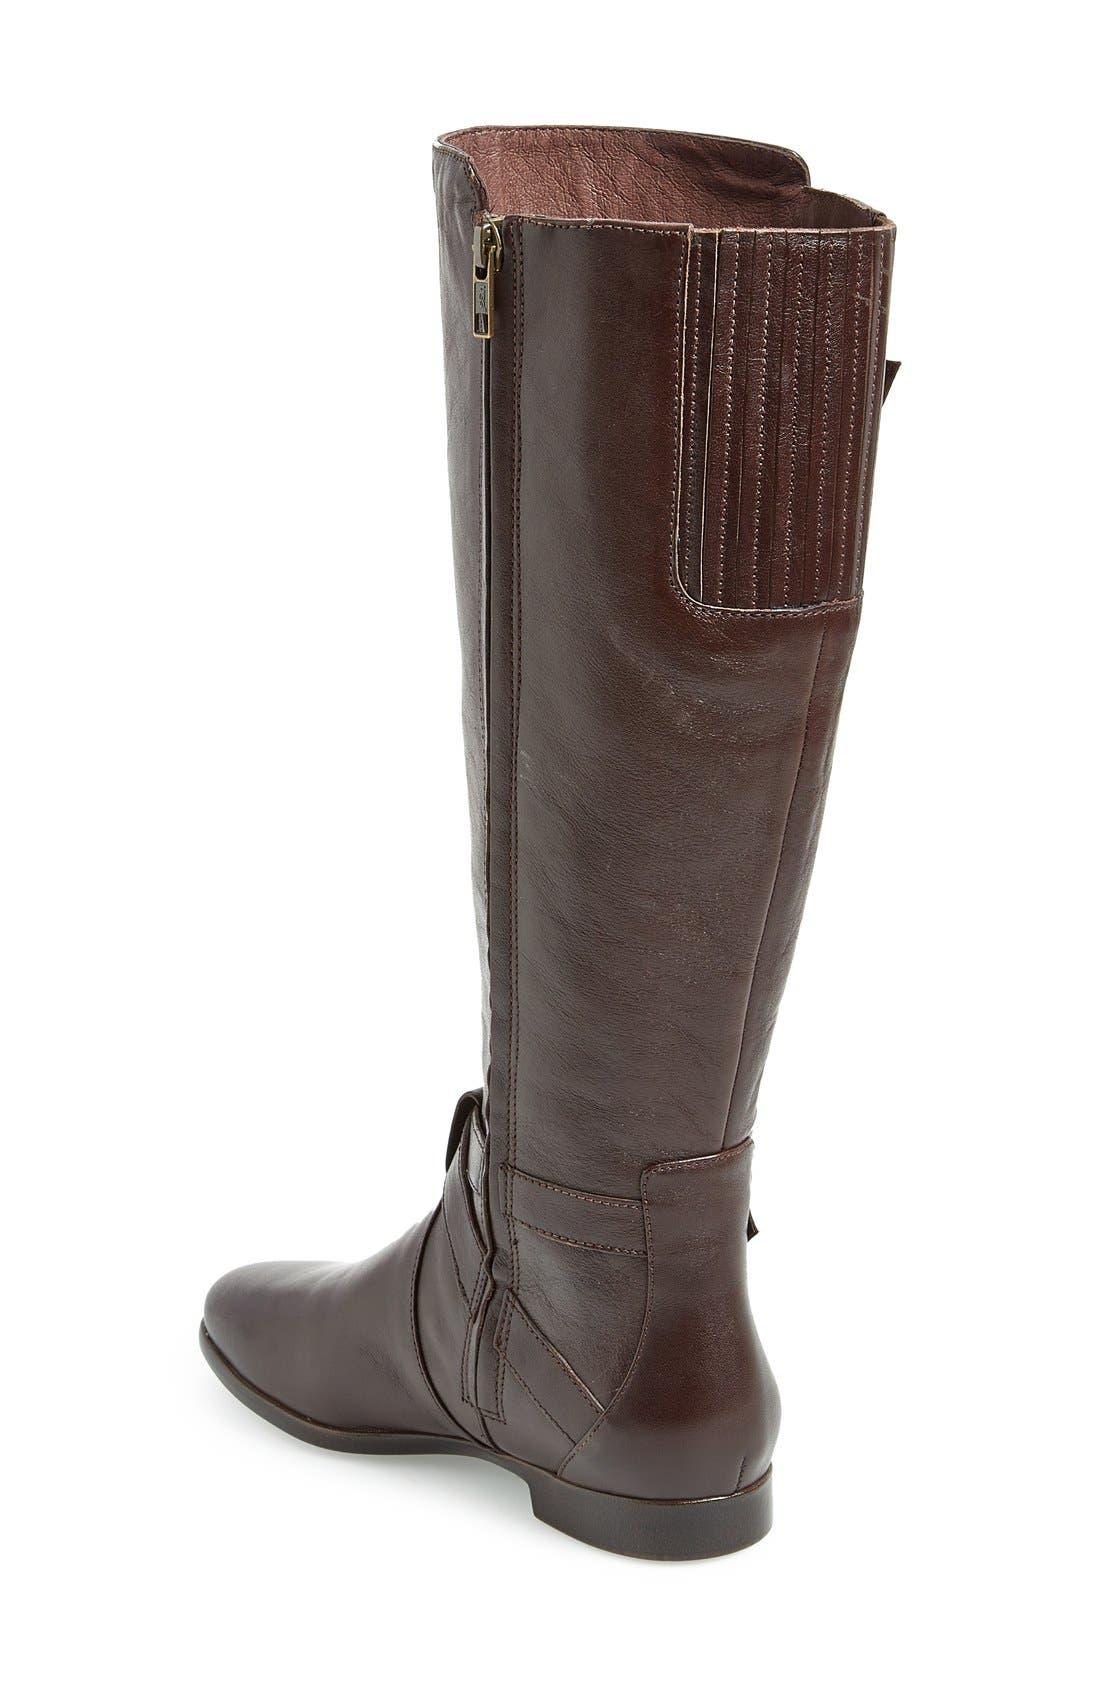 Alternate Image 2  - UGG® Australia 'Beryl' Riding Boot (Wide Calf) (Women)